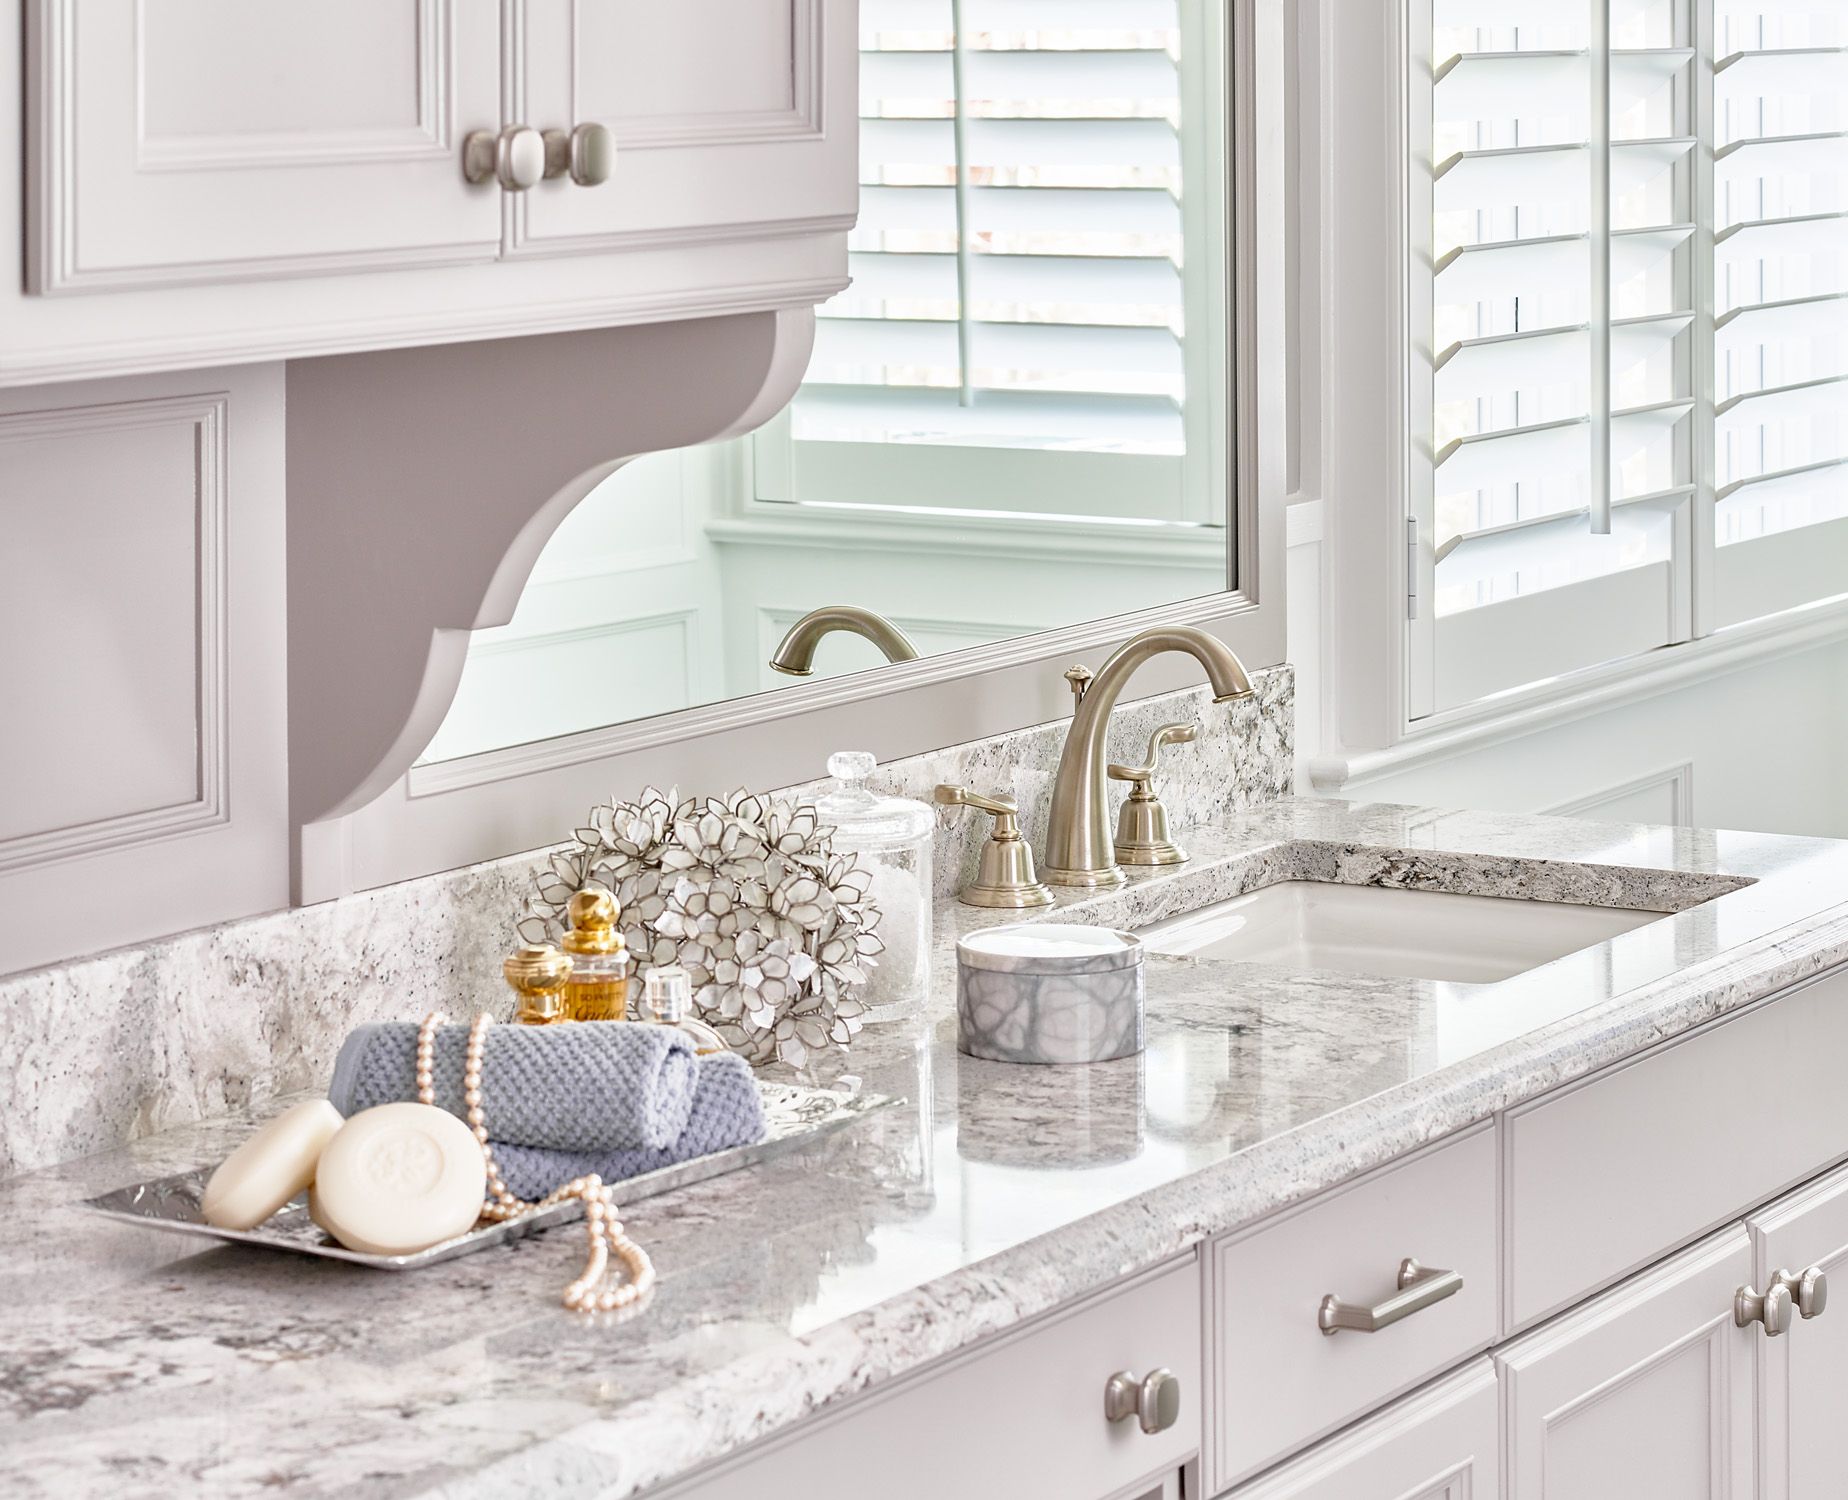 Master bathroom vanity with quartz counters